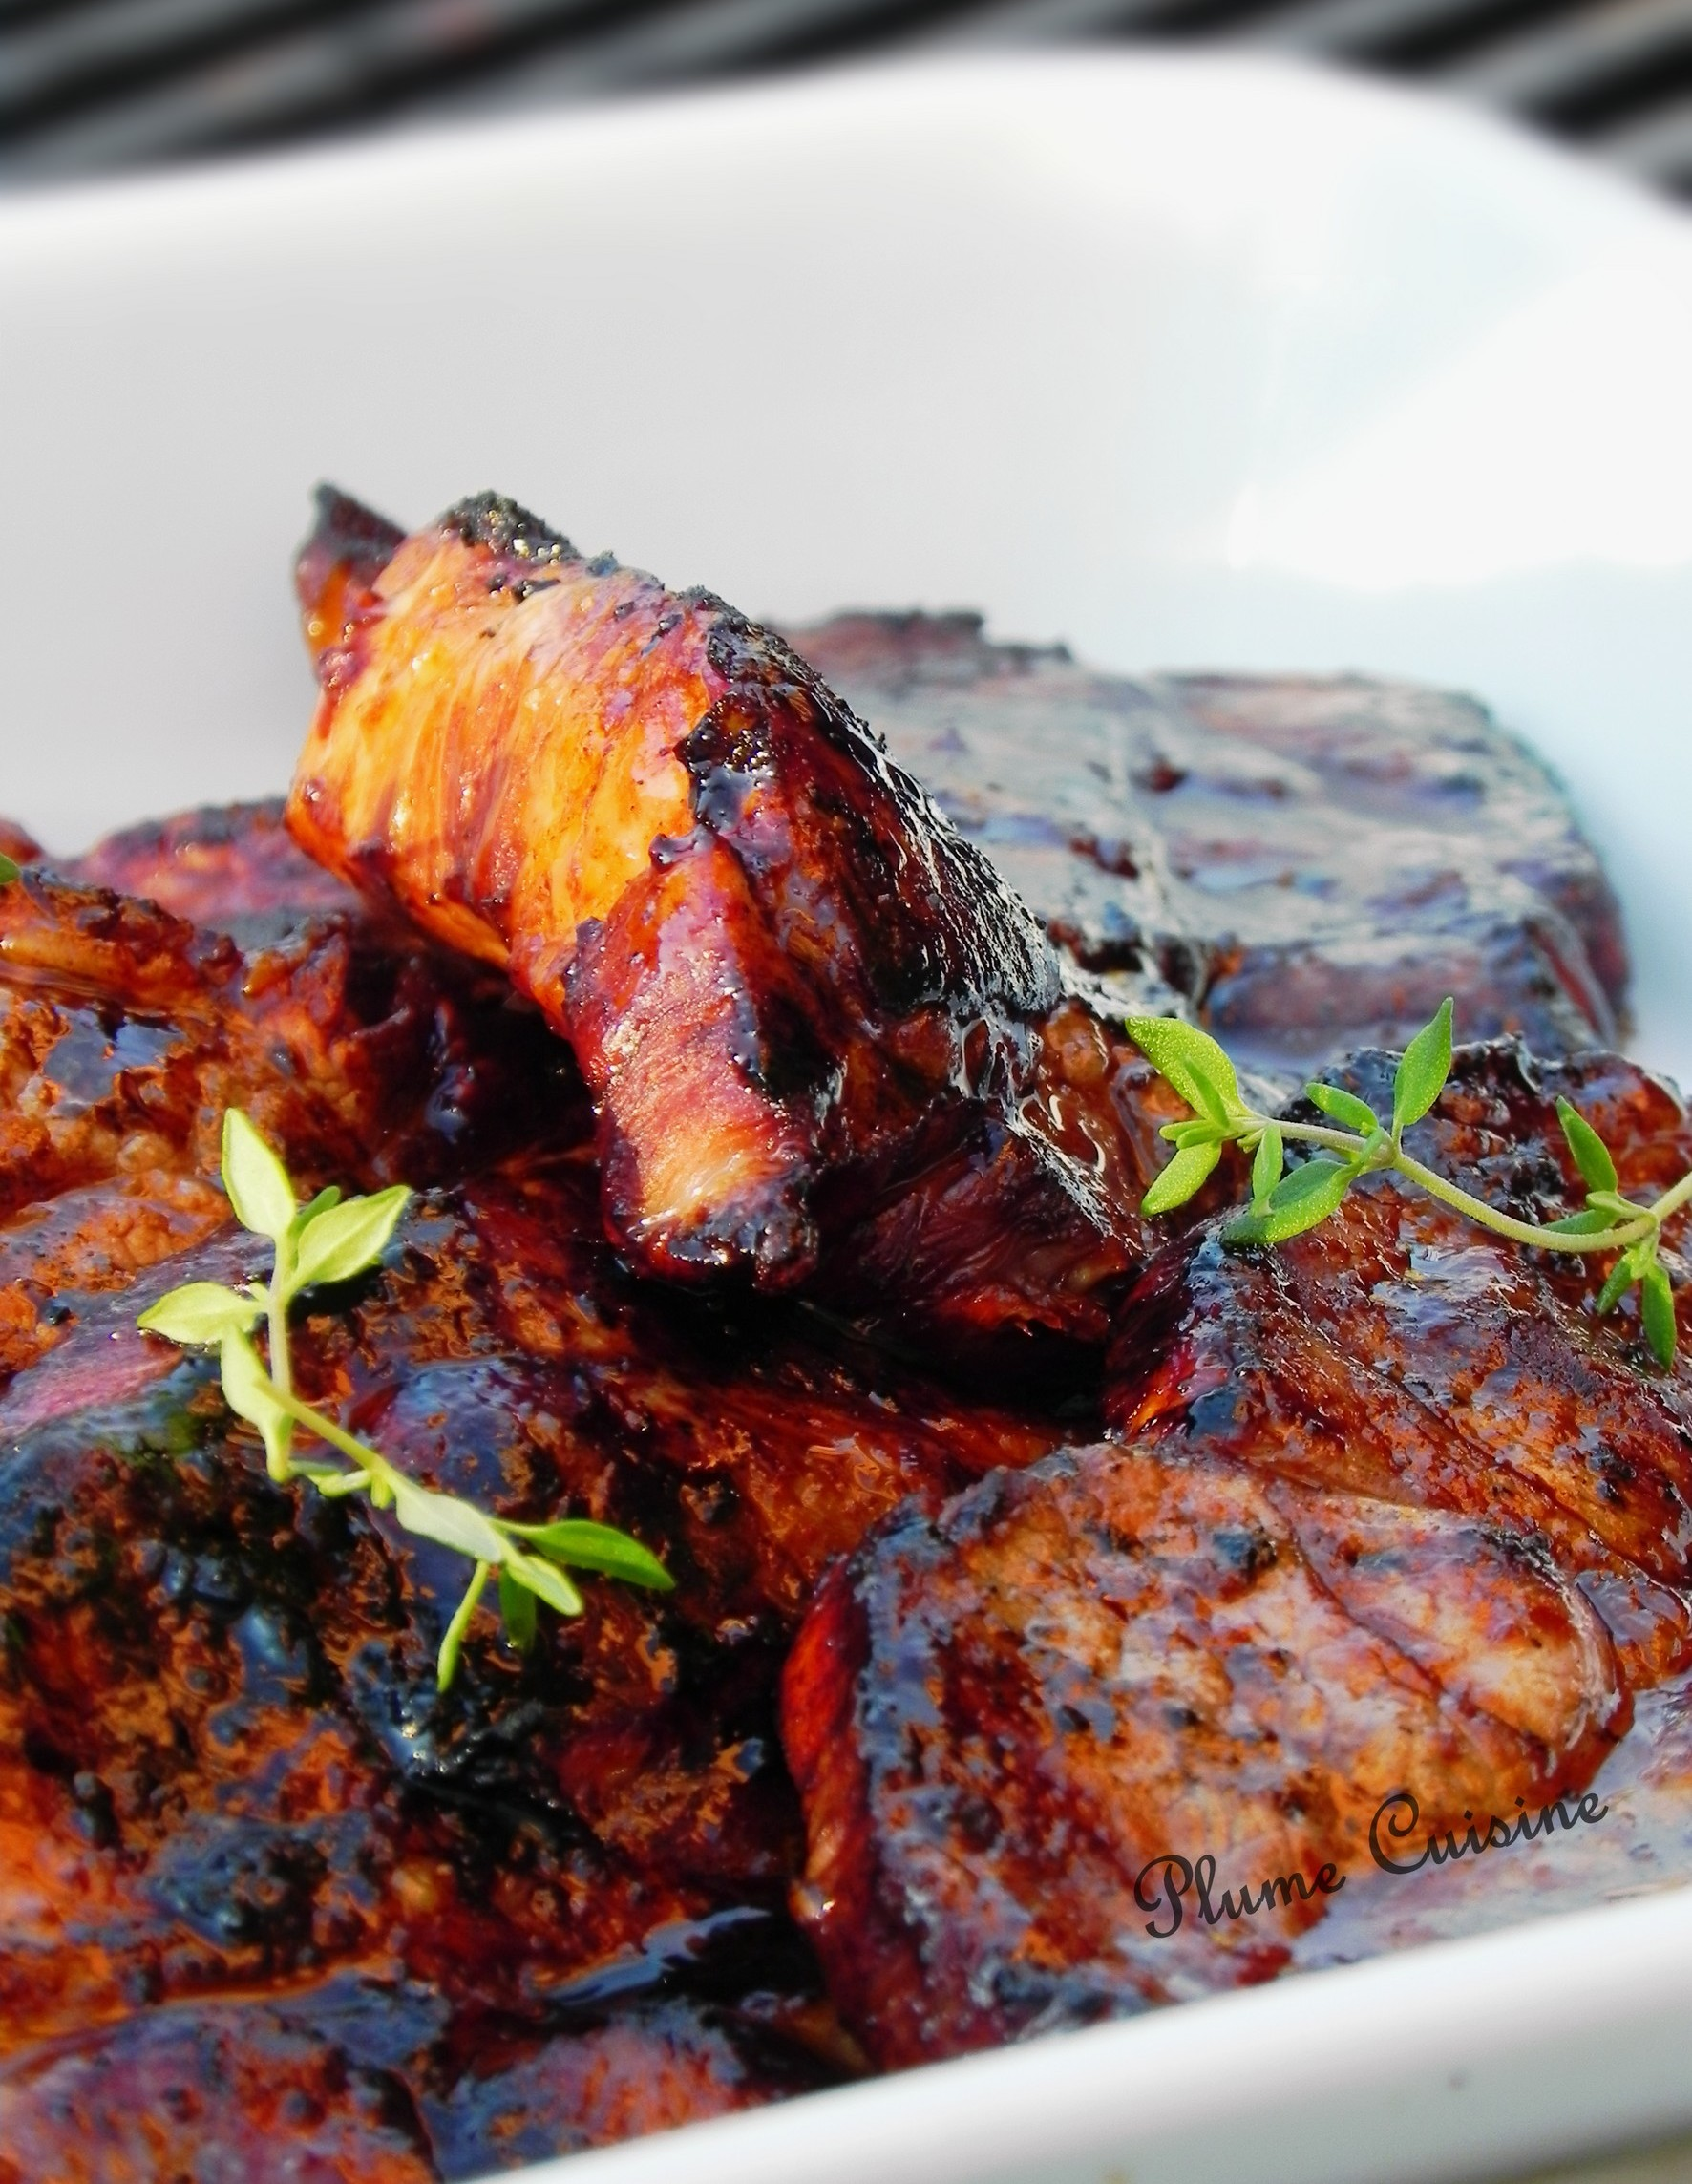 Marinade Cote De Porc Barbecue : marinade, barbecue, Marinade, Côtelettes, Grillées,, Citron